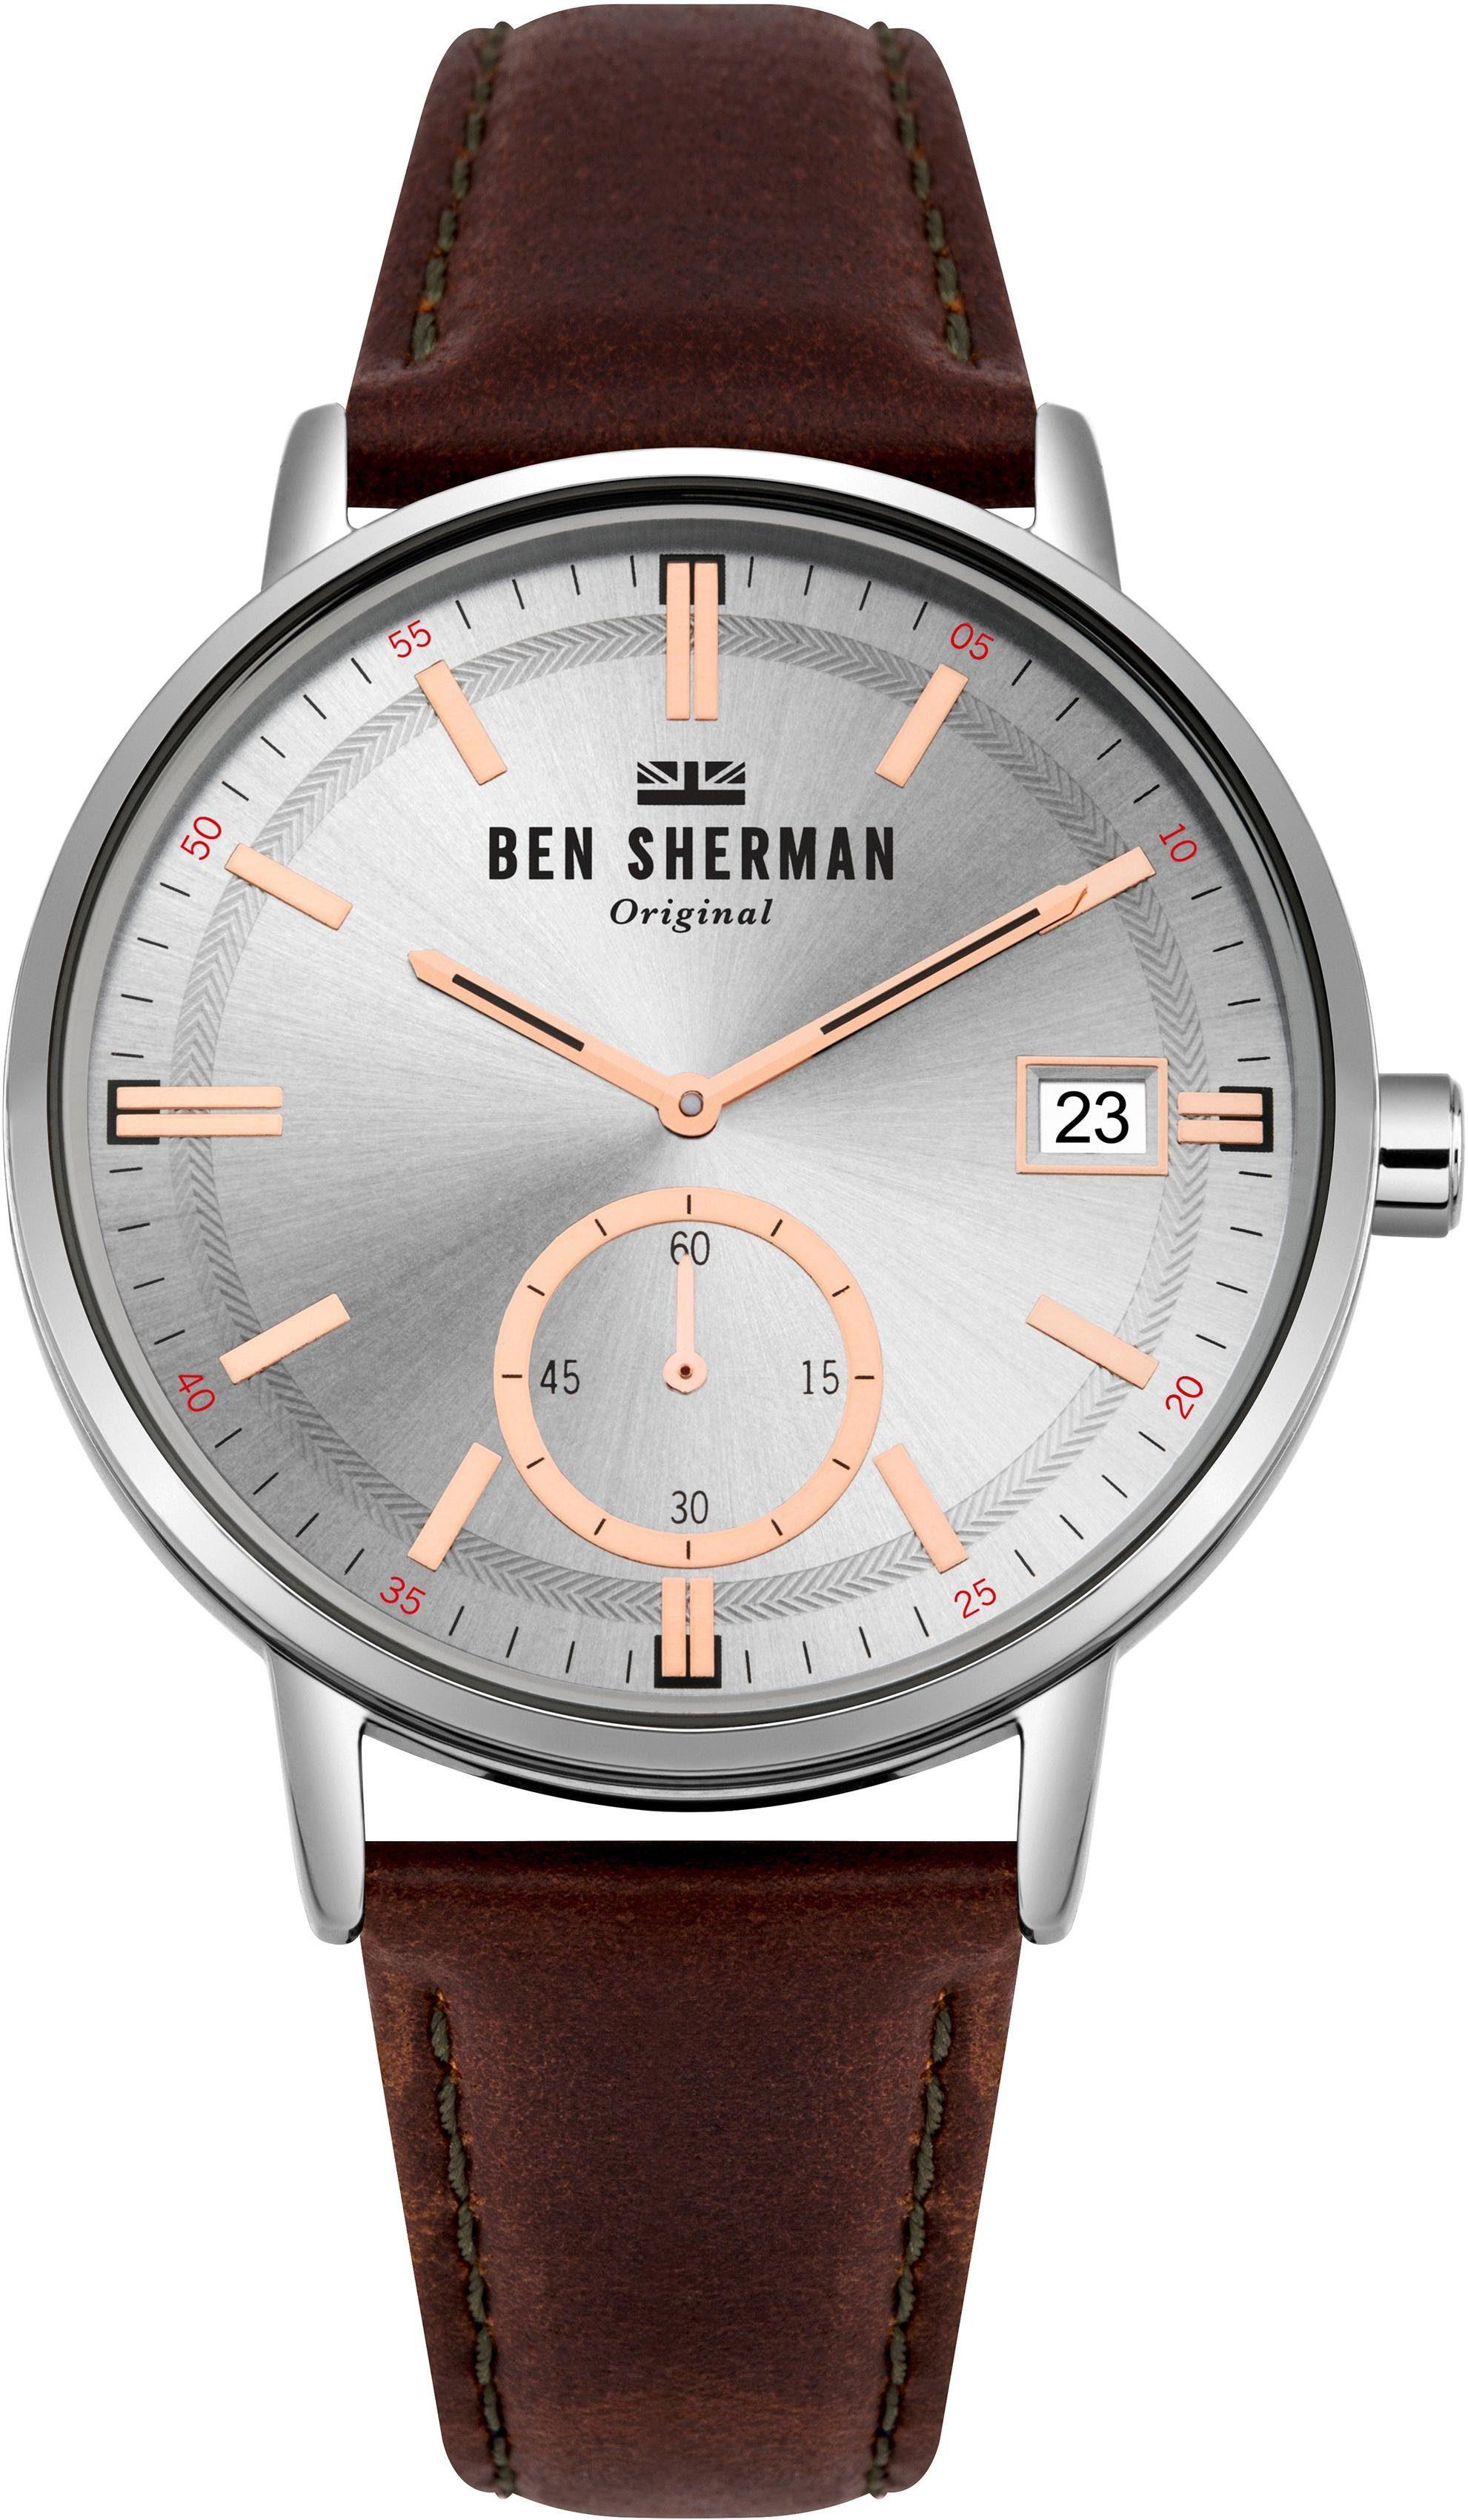 Ben Sherman Quarzuhr »Portobello Professional Day-Date, WB071SBR« mit kleiner Sekunde